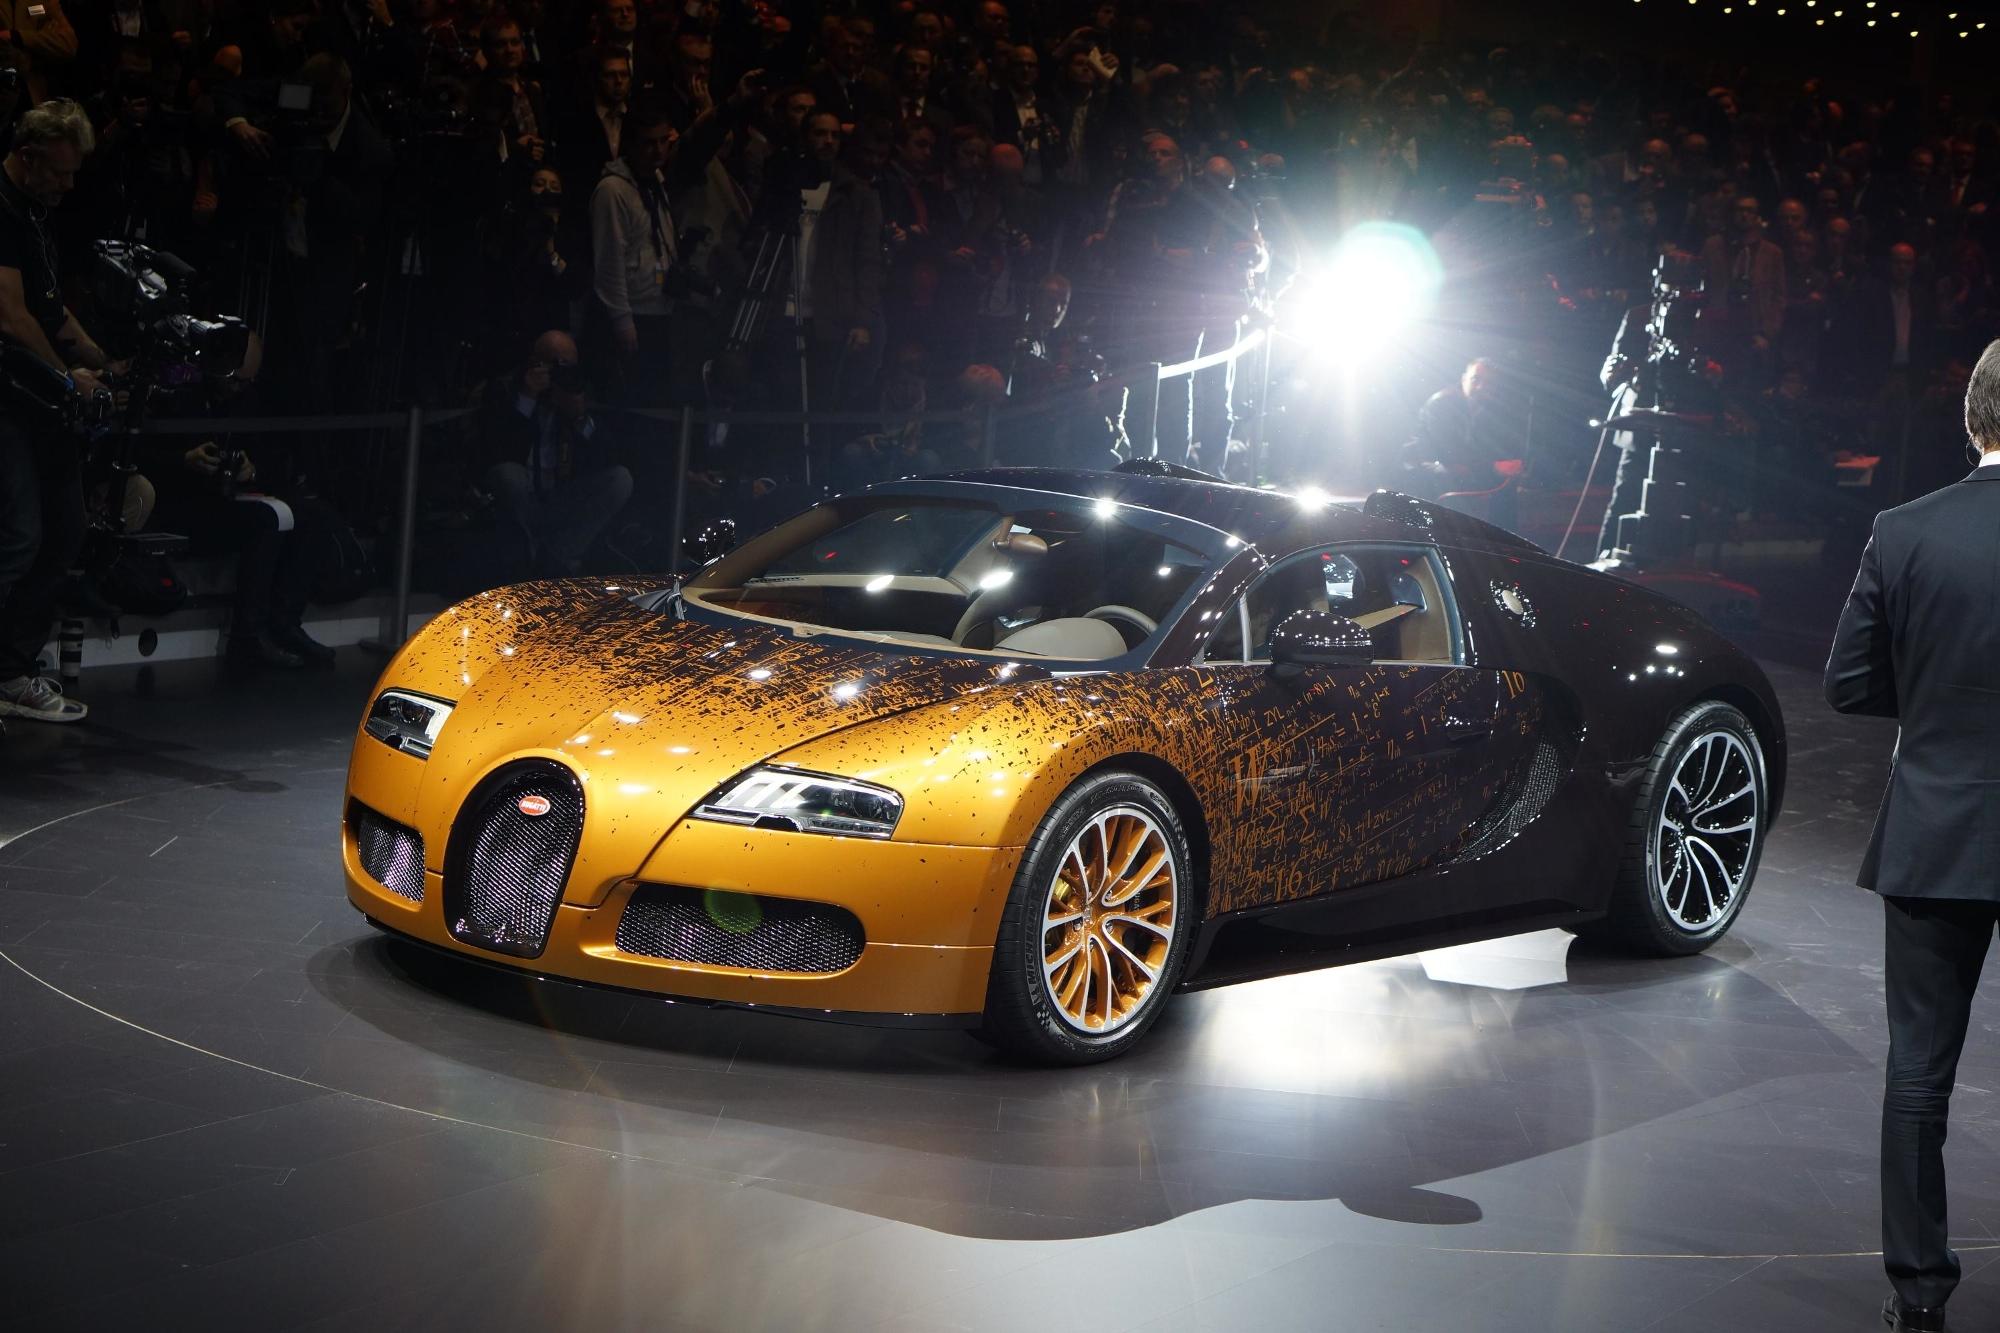 bugatti-veyron-grand-sport-venet-is-a-rusty-piece-of-art-live-photos_3